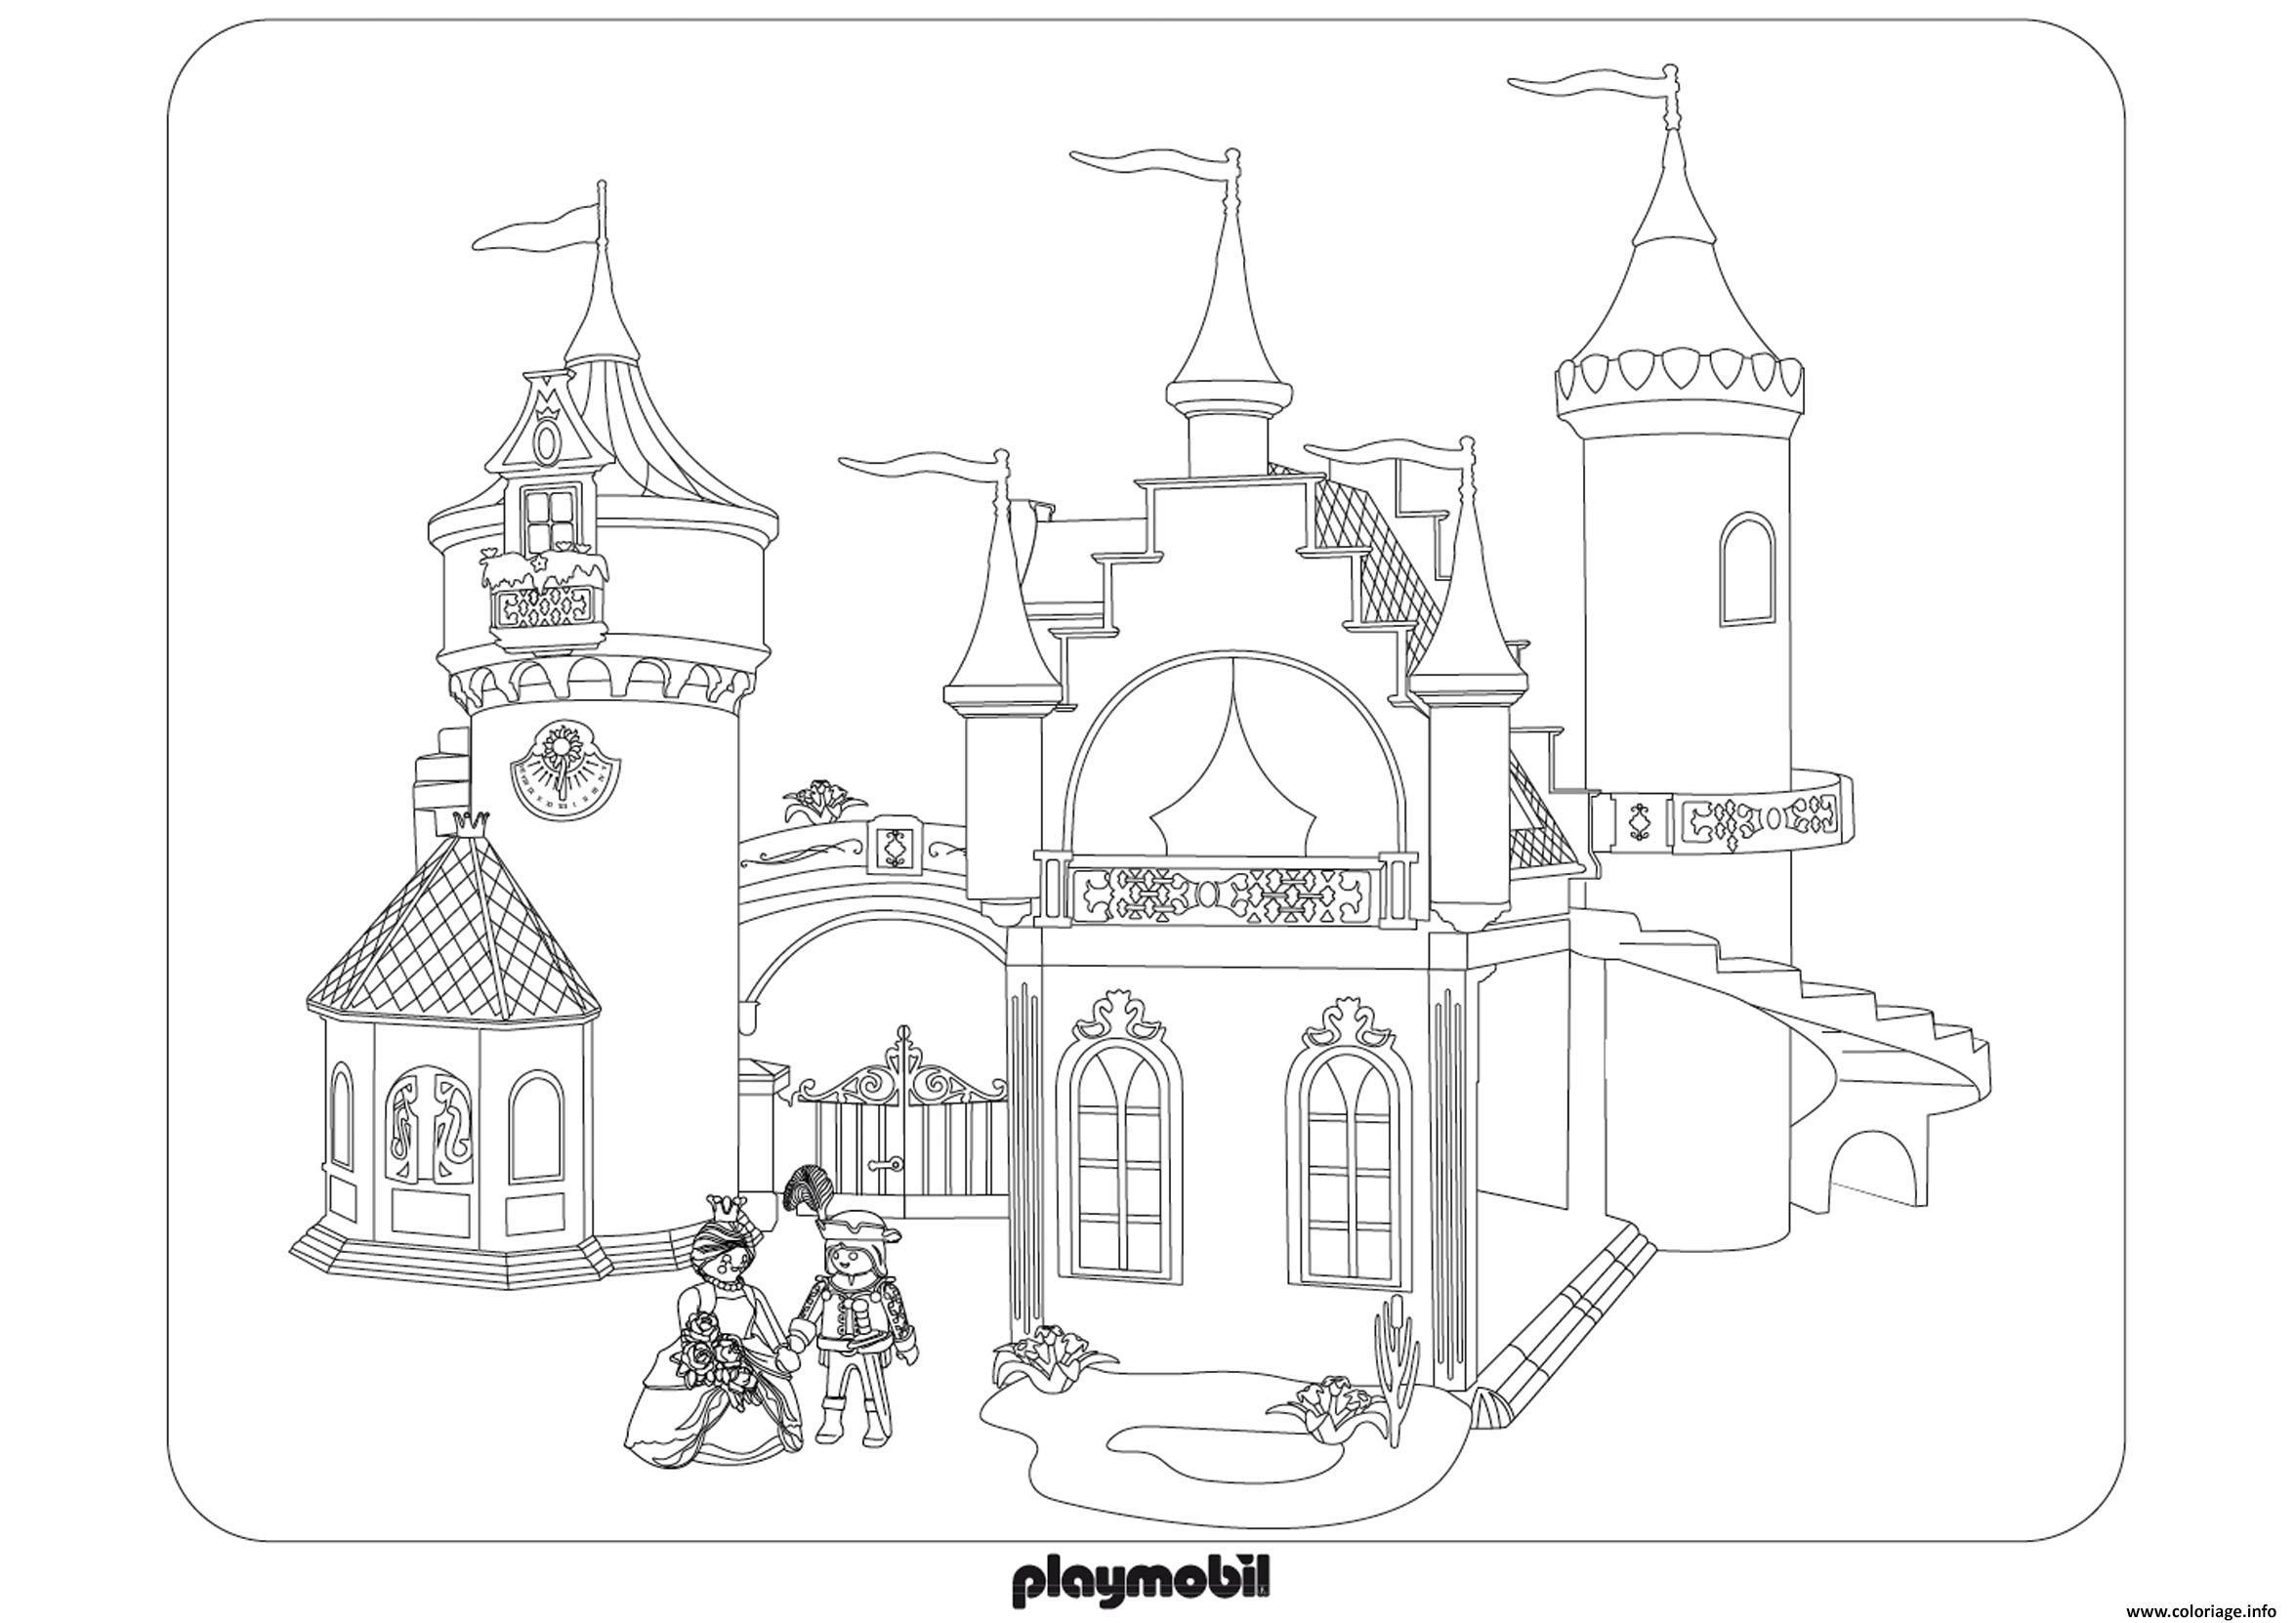 Coloriage Chateau Princesse A Imprimer.Coloriage Chateau Roi Reine Princesse Playmobil Dessin